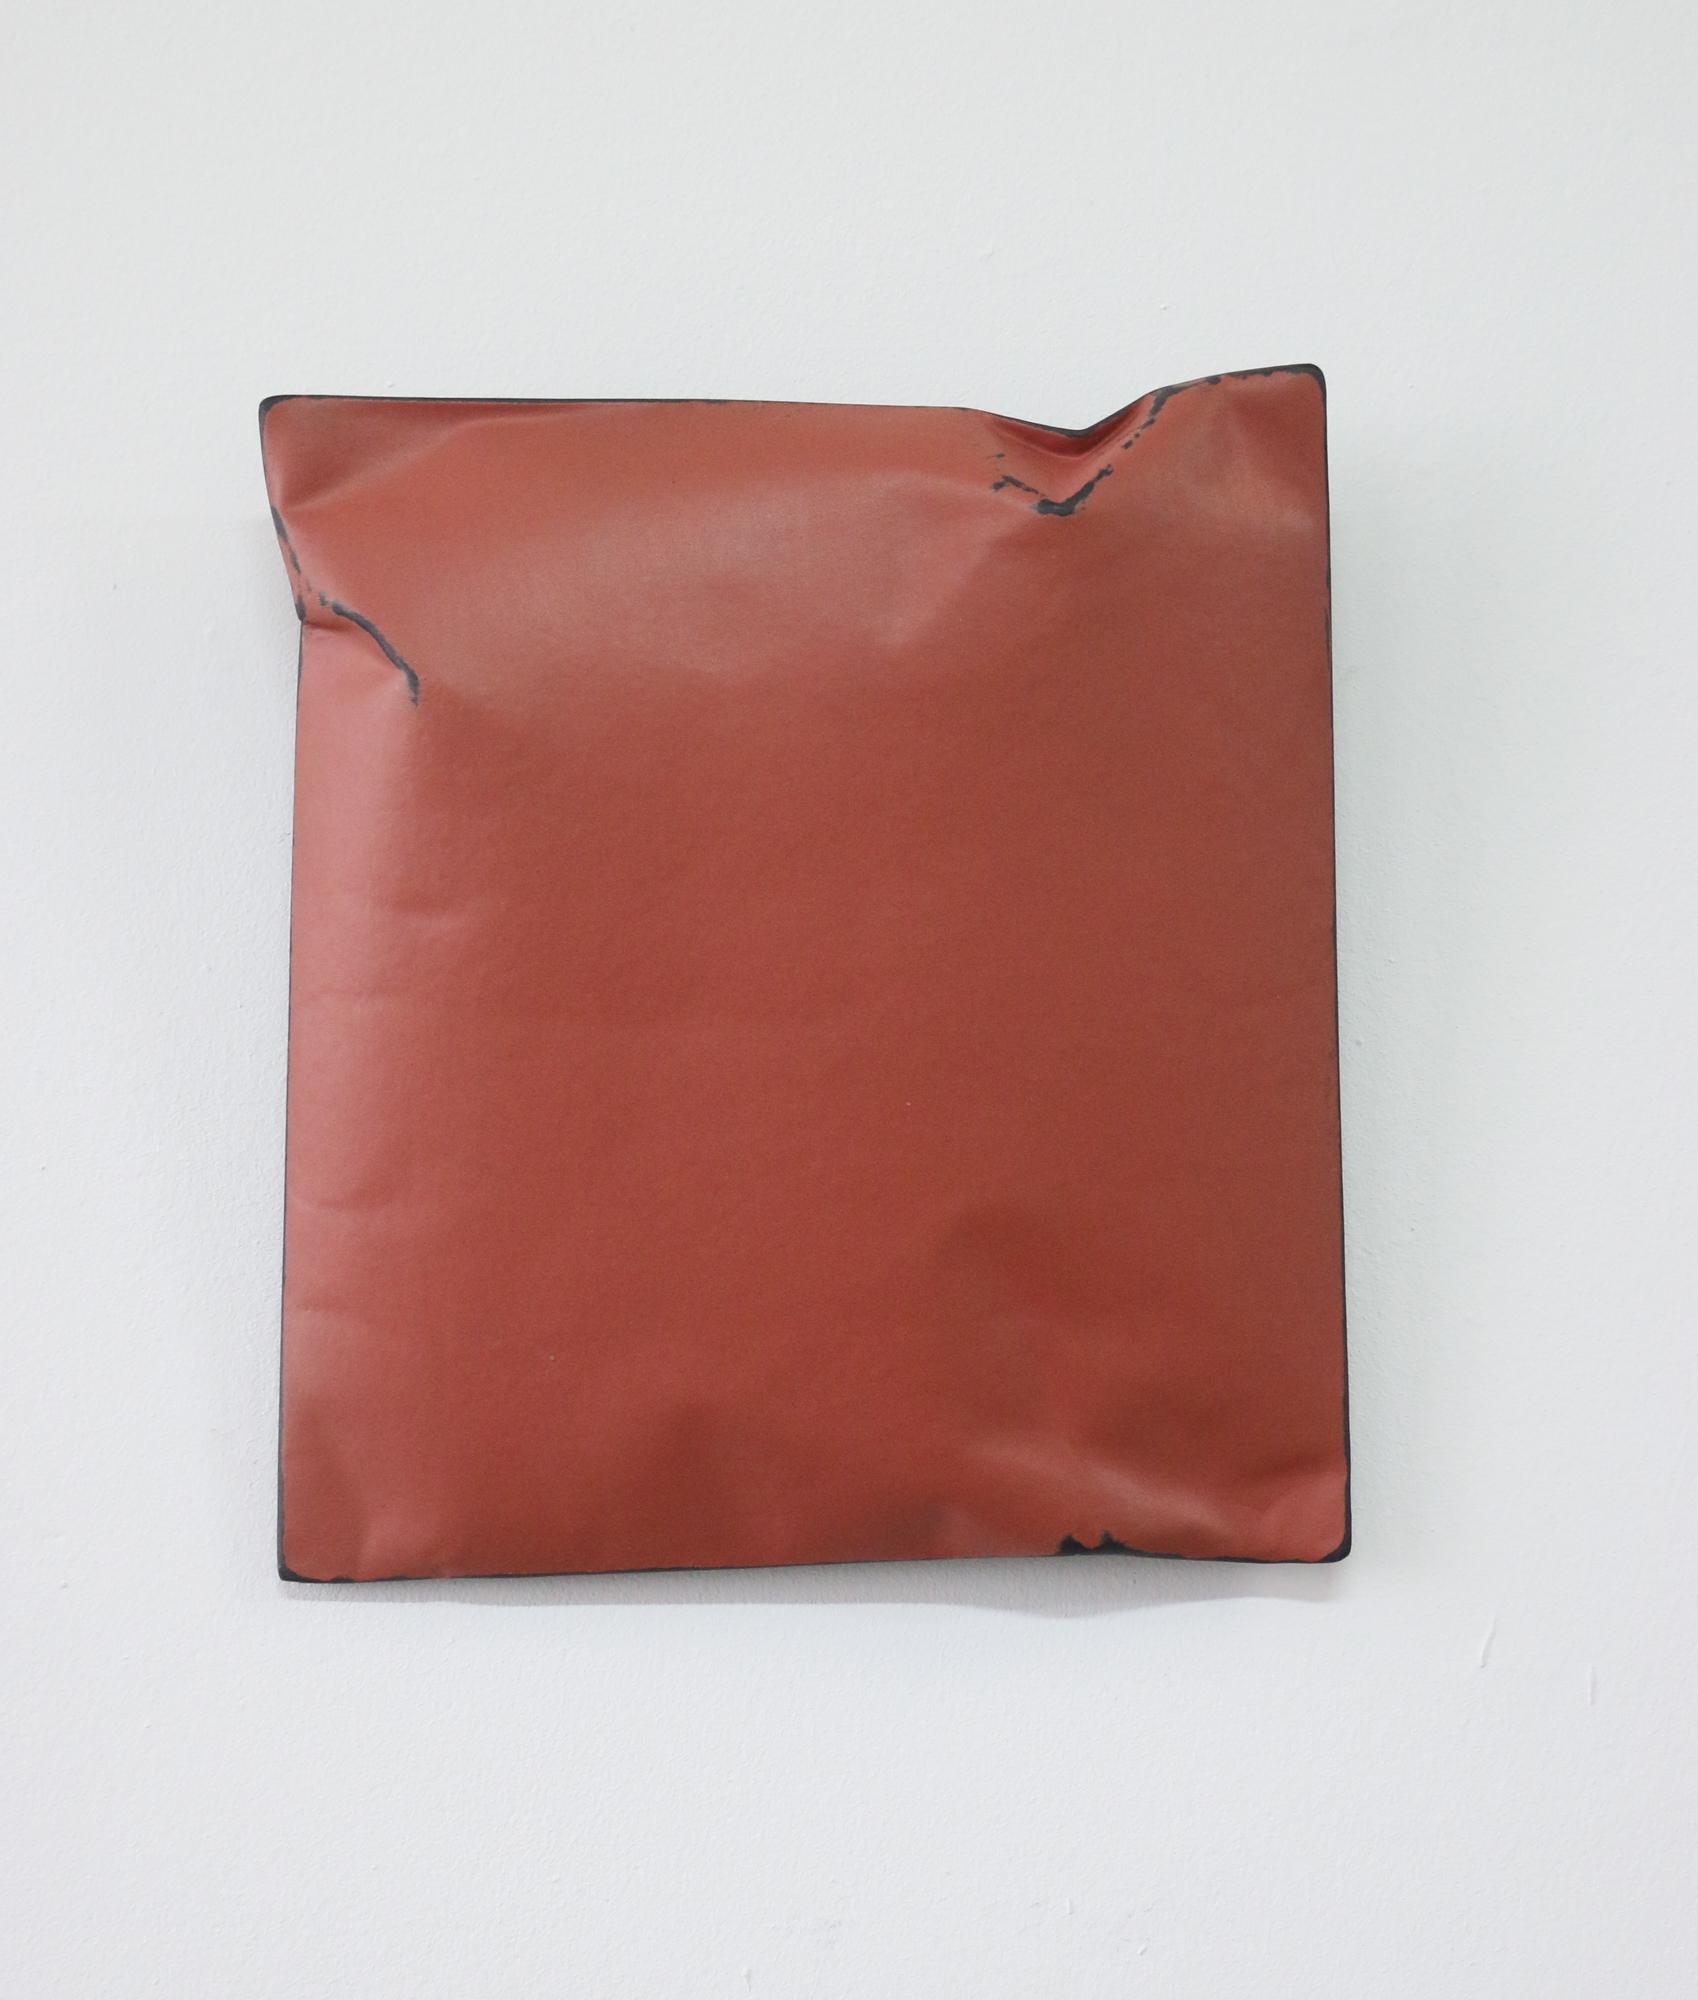 Johan De Wit, Untitled, 2018, Paper, Resin, Marble, Acrylic, 21 x 19 x 4 cm